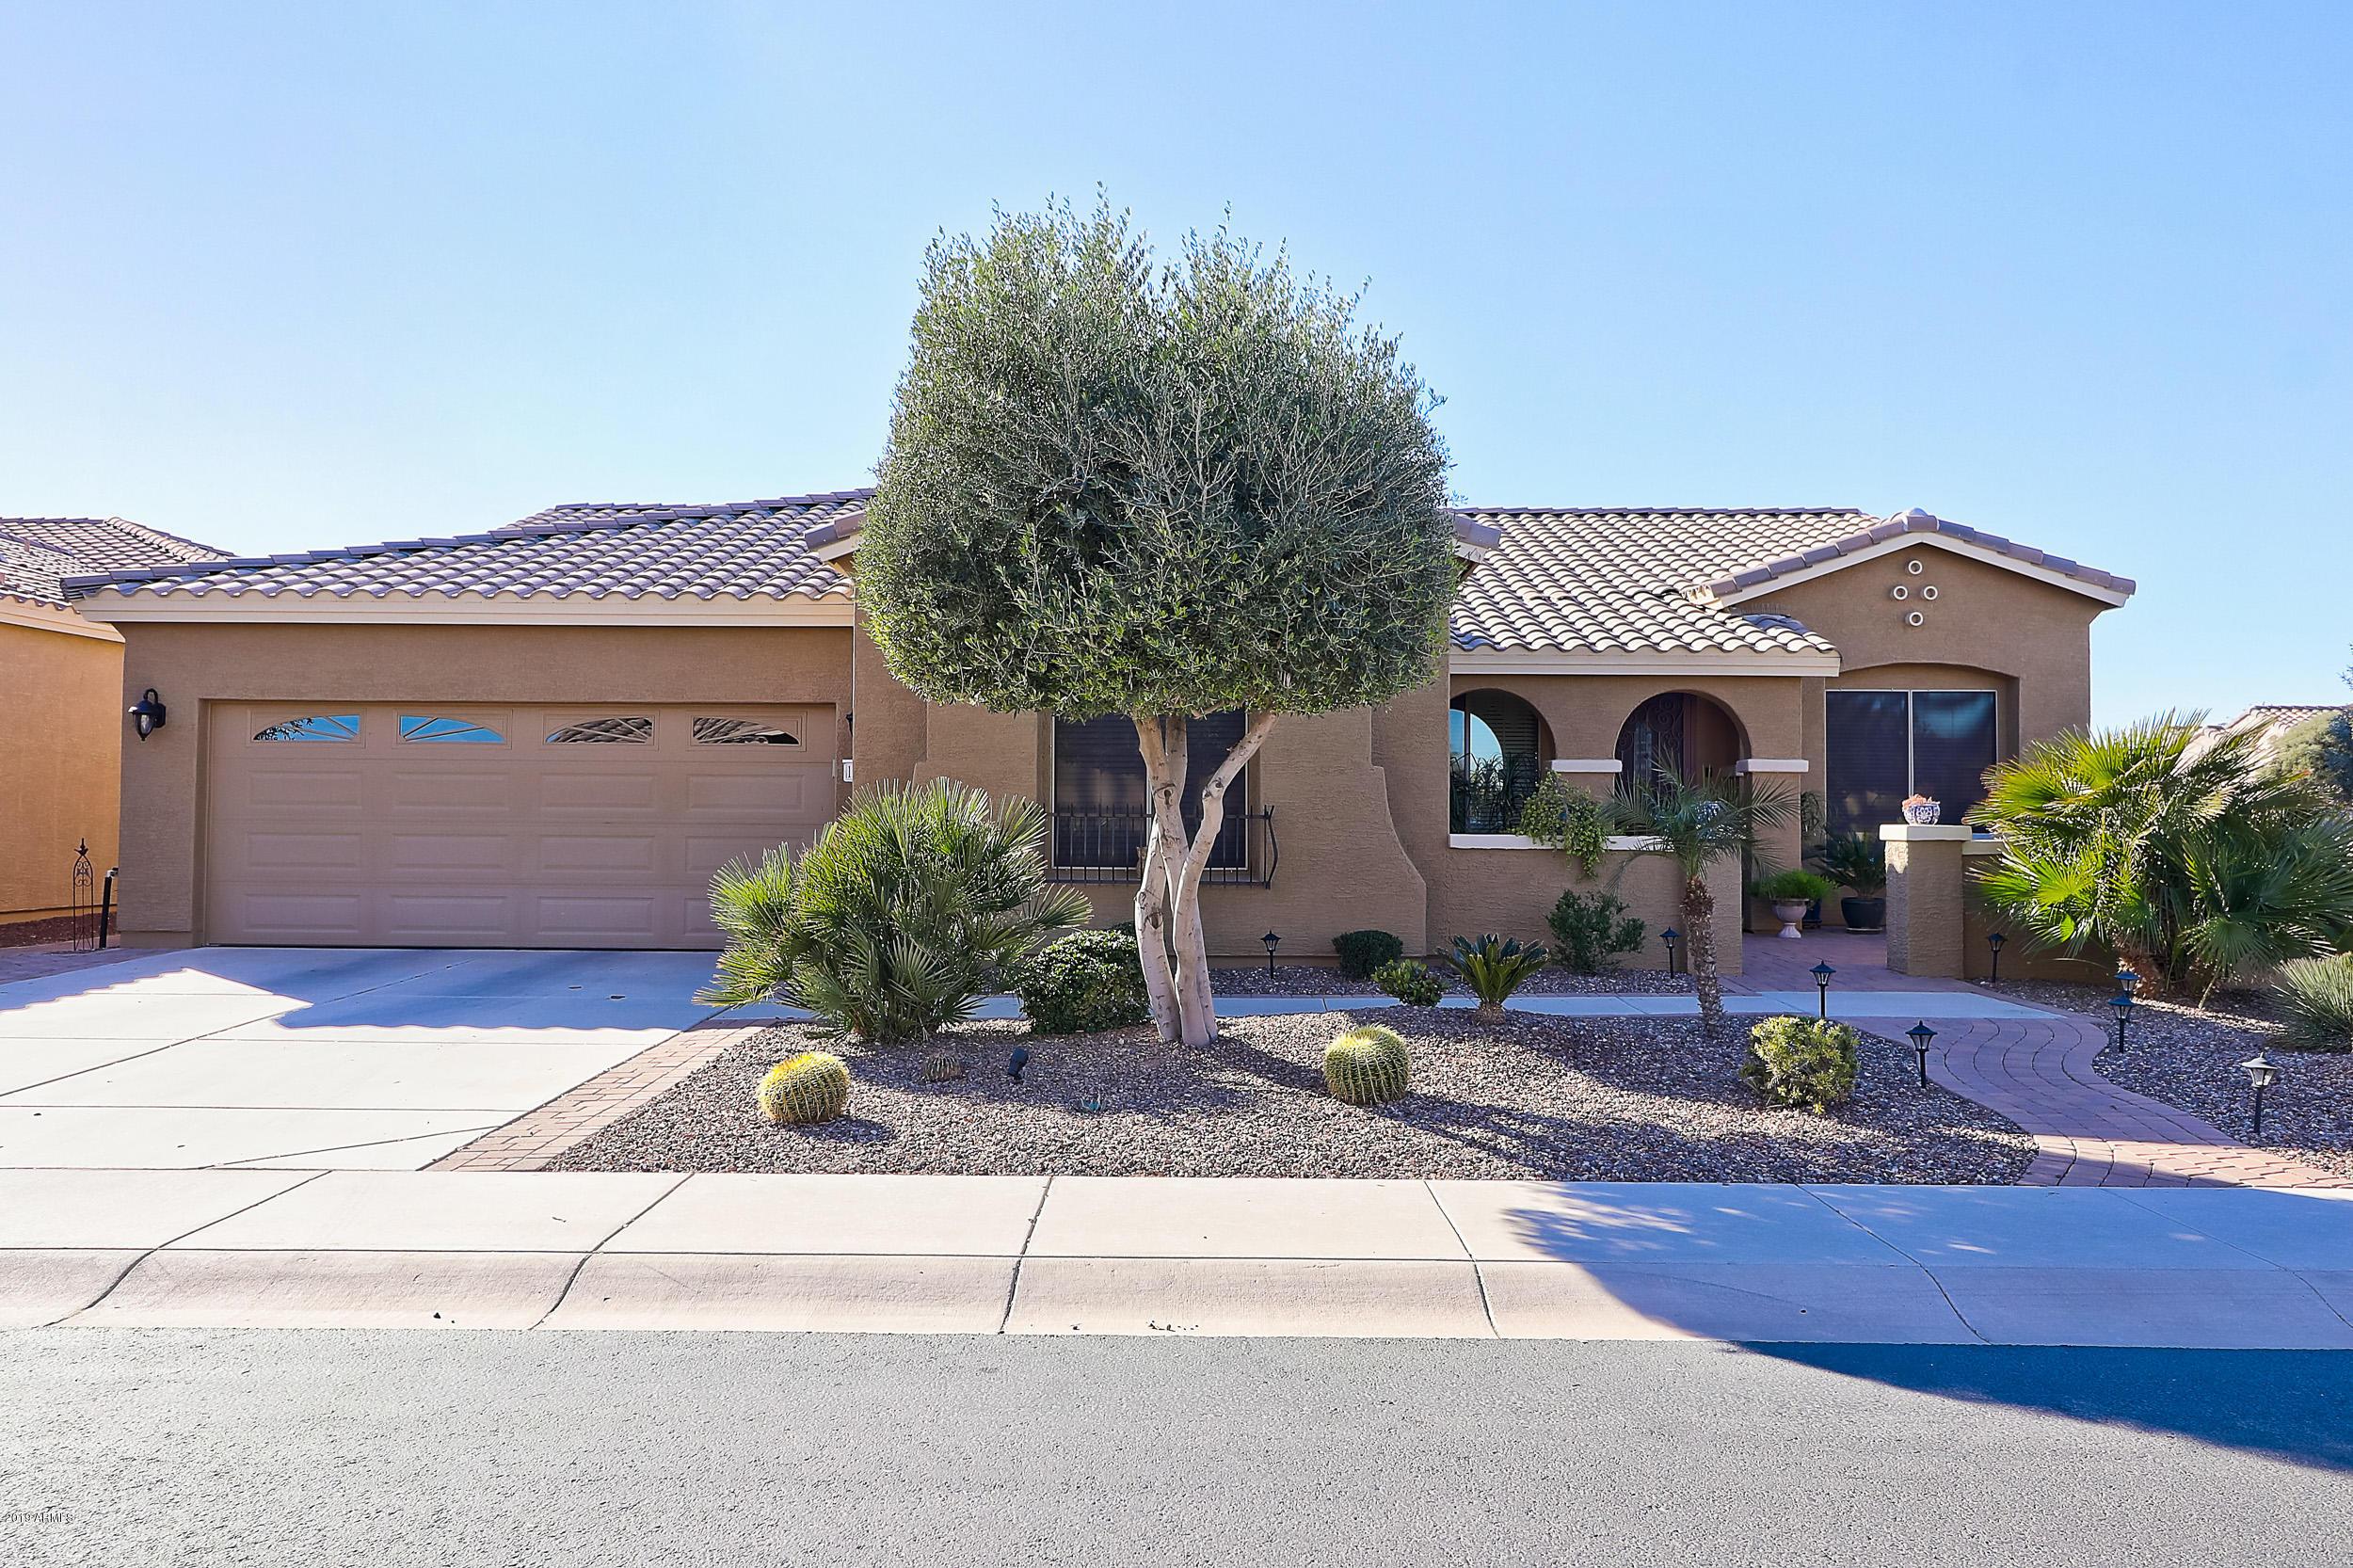 Photo for 19834 N Heron Court, Maricopa, AZ 85138 (MLS # 5863894)